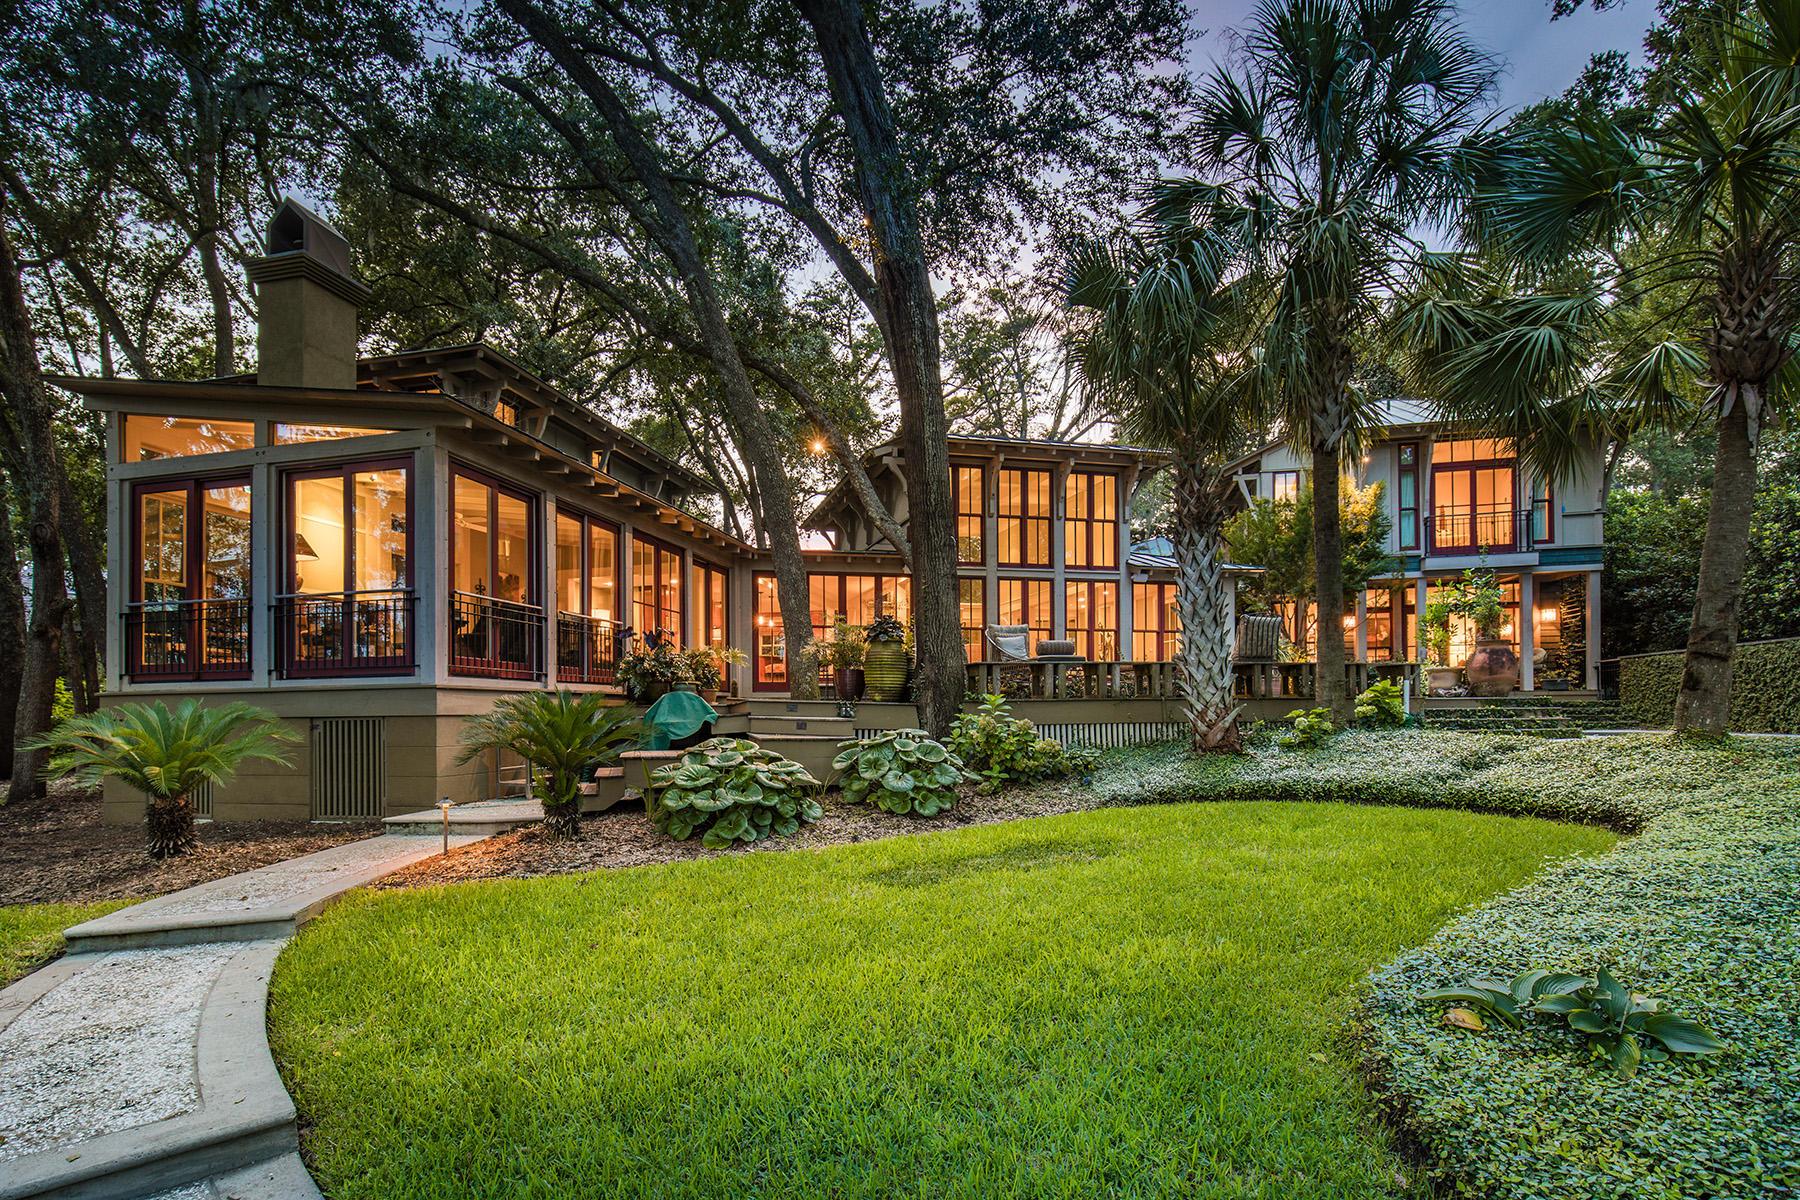 Ellis Oaks Homes For Sale - 672 Ellis Oak, Charleston, SC - 5